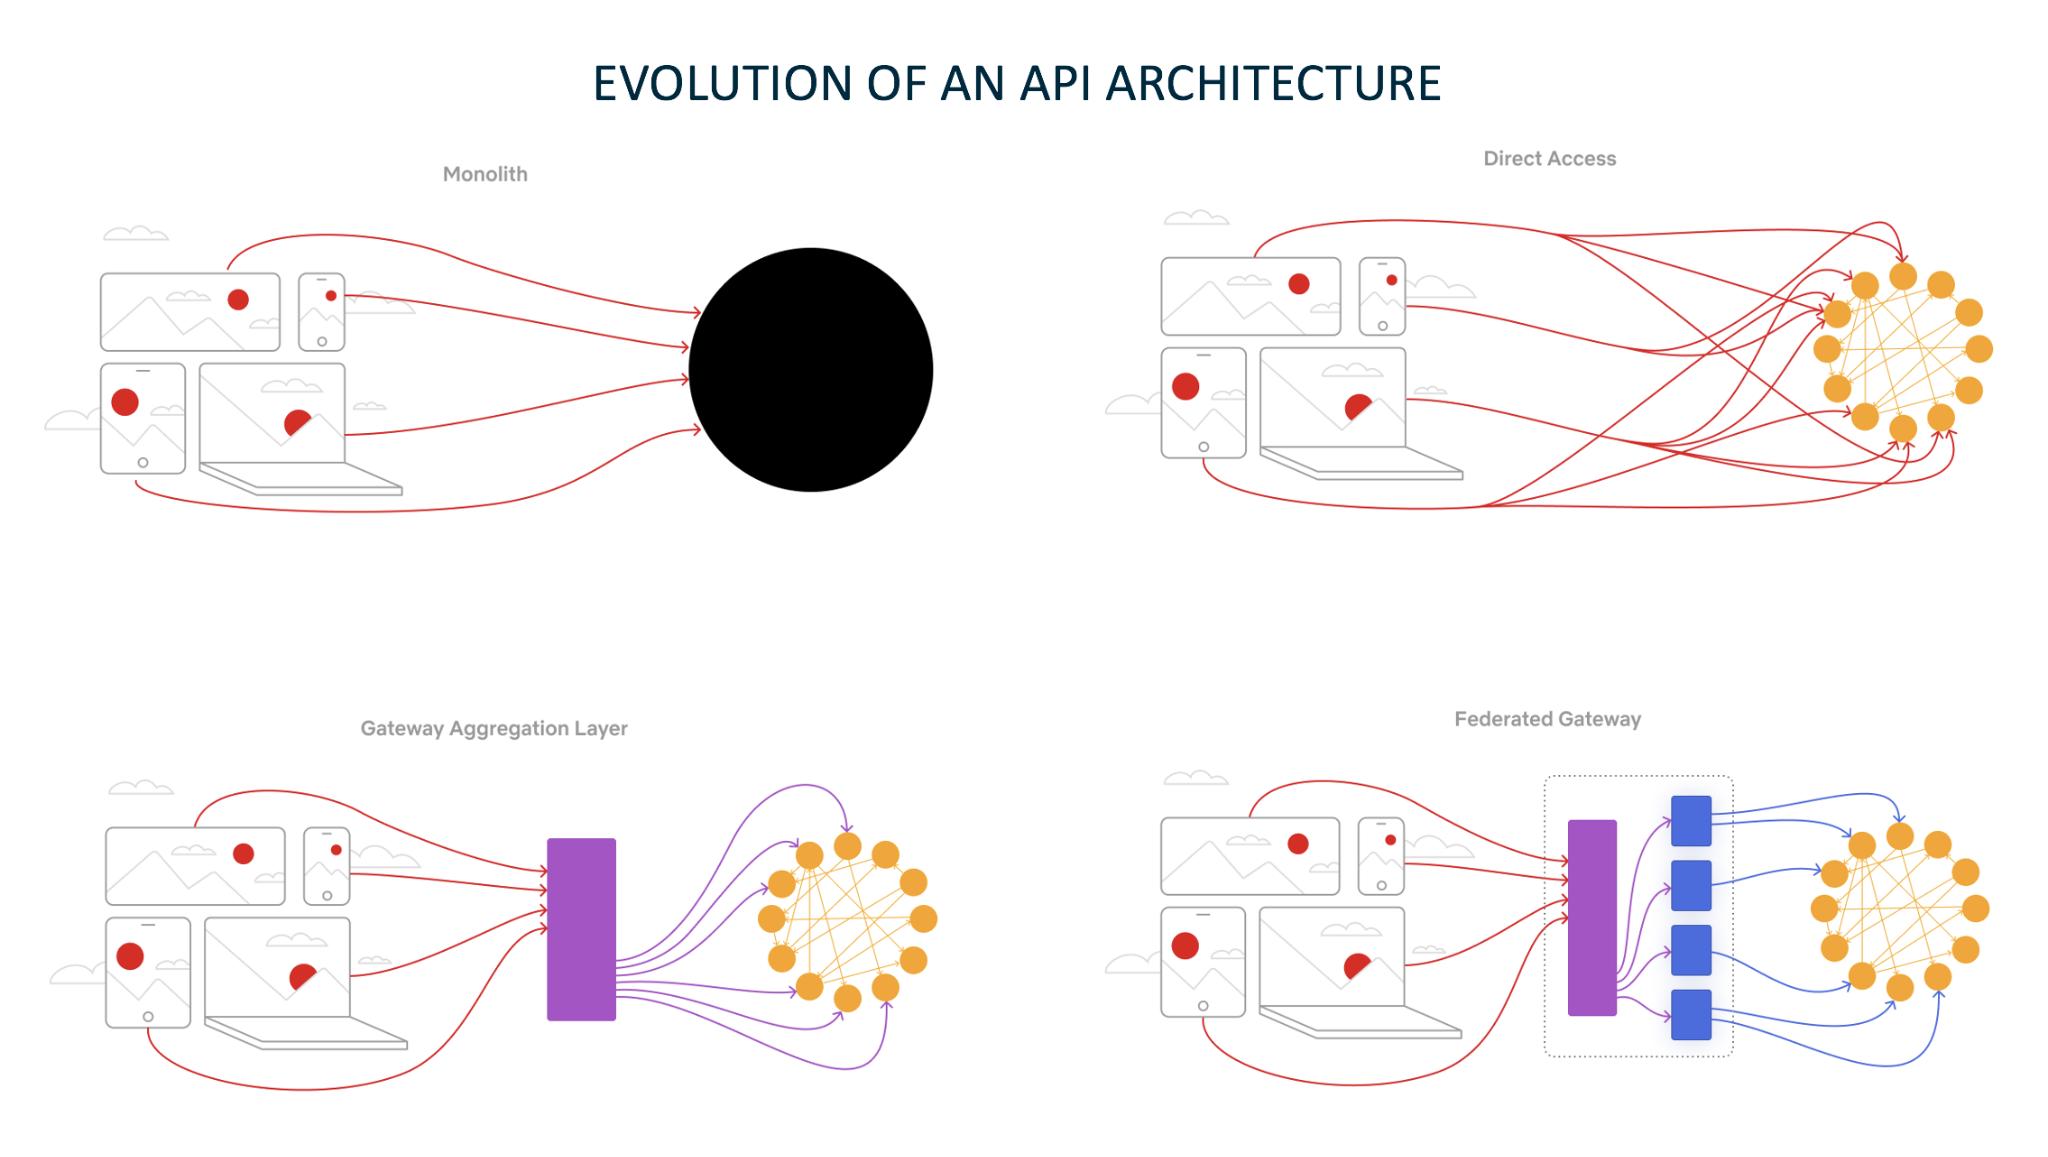 api architecture evolution